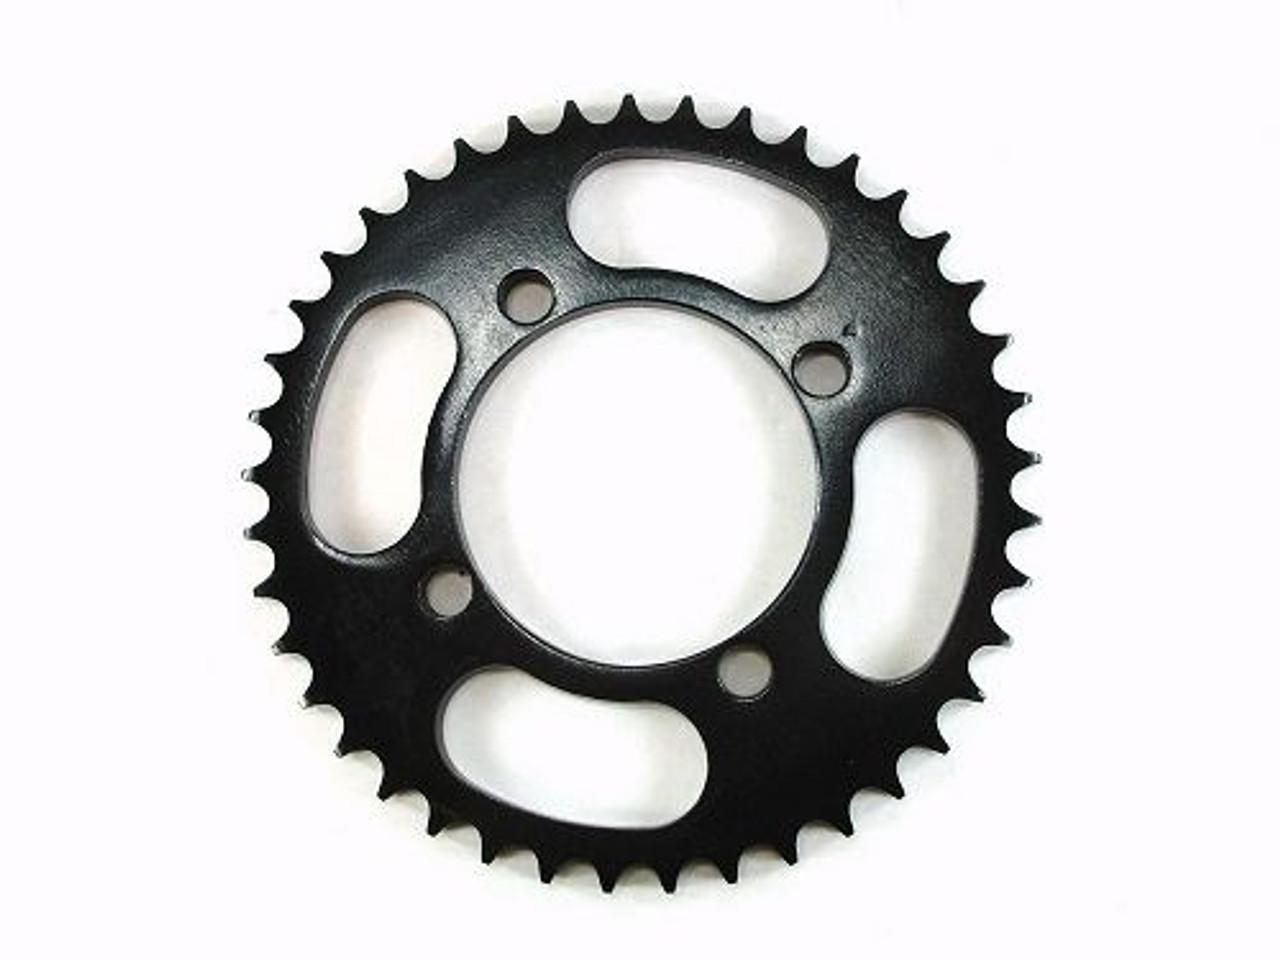 SSR Dirt Bike Rear Sprocket for SR150, SR189, XF250, SR250, SR450